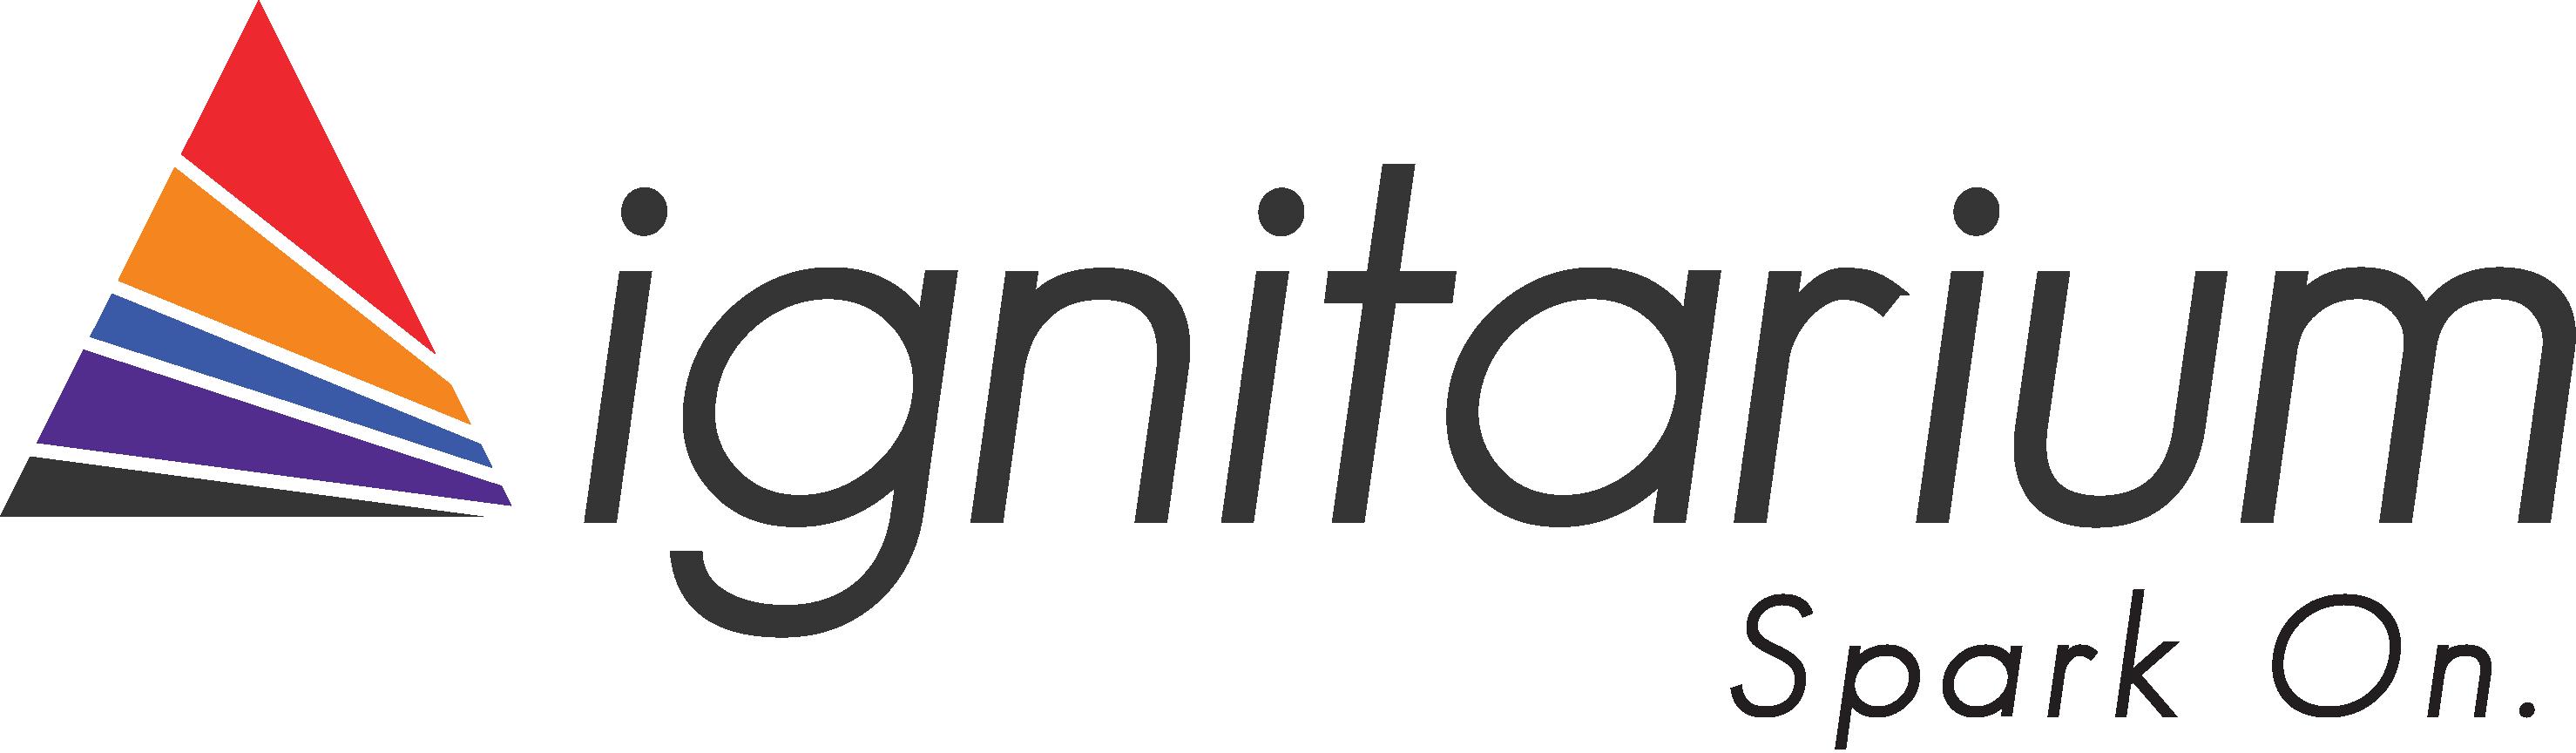 Ignitarium is now part of the Arm AI Partner Program